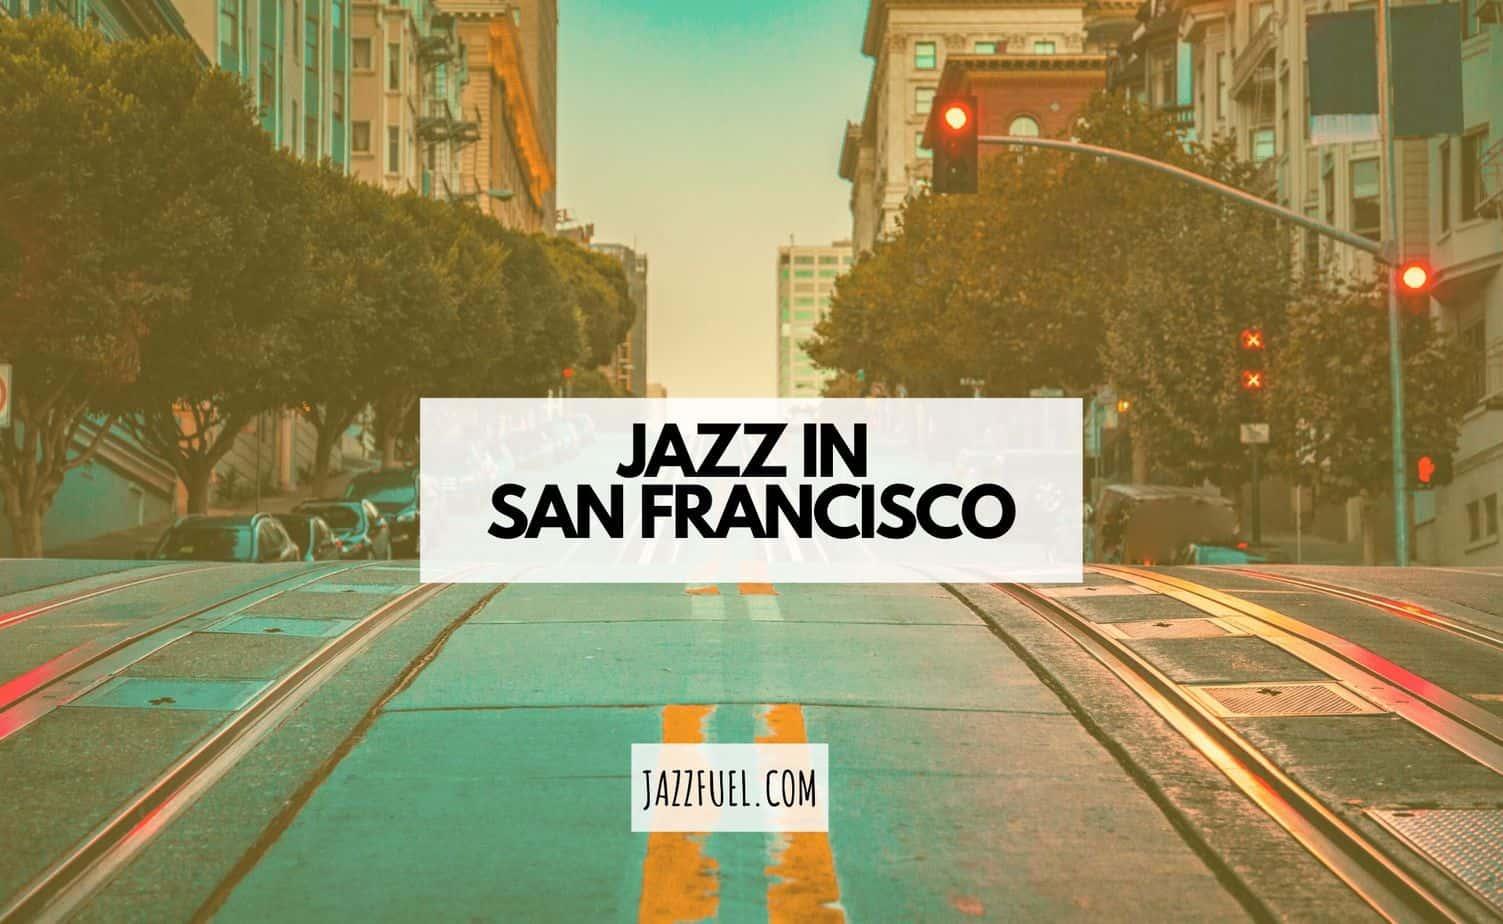 Jazz in San Francisco